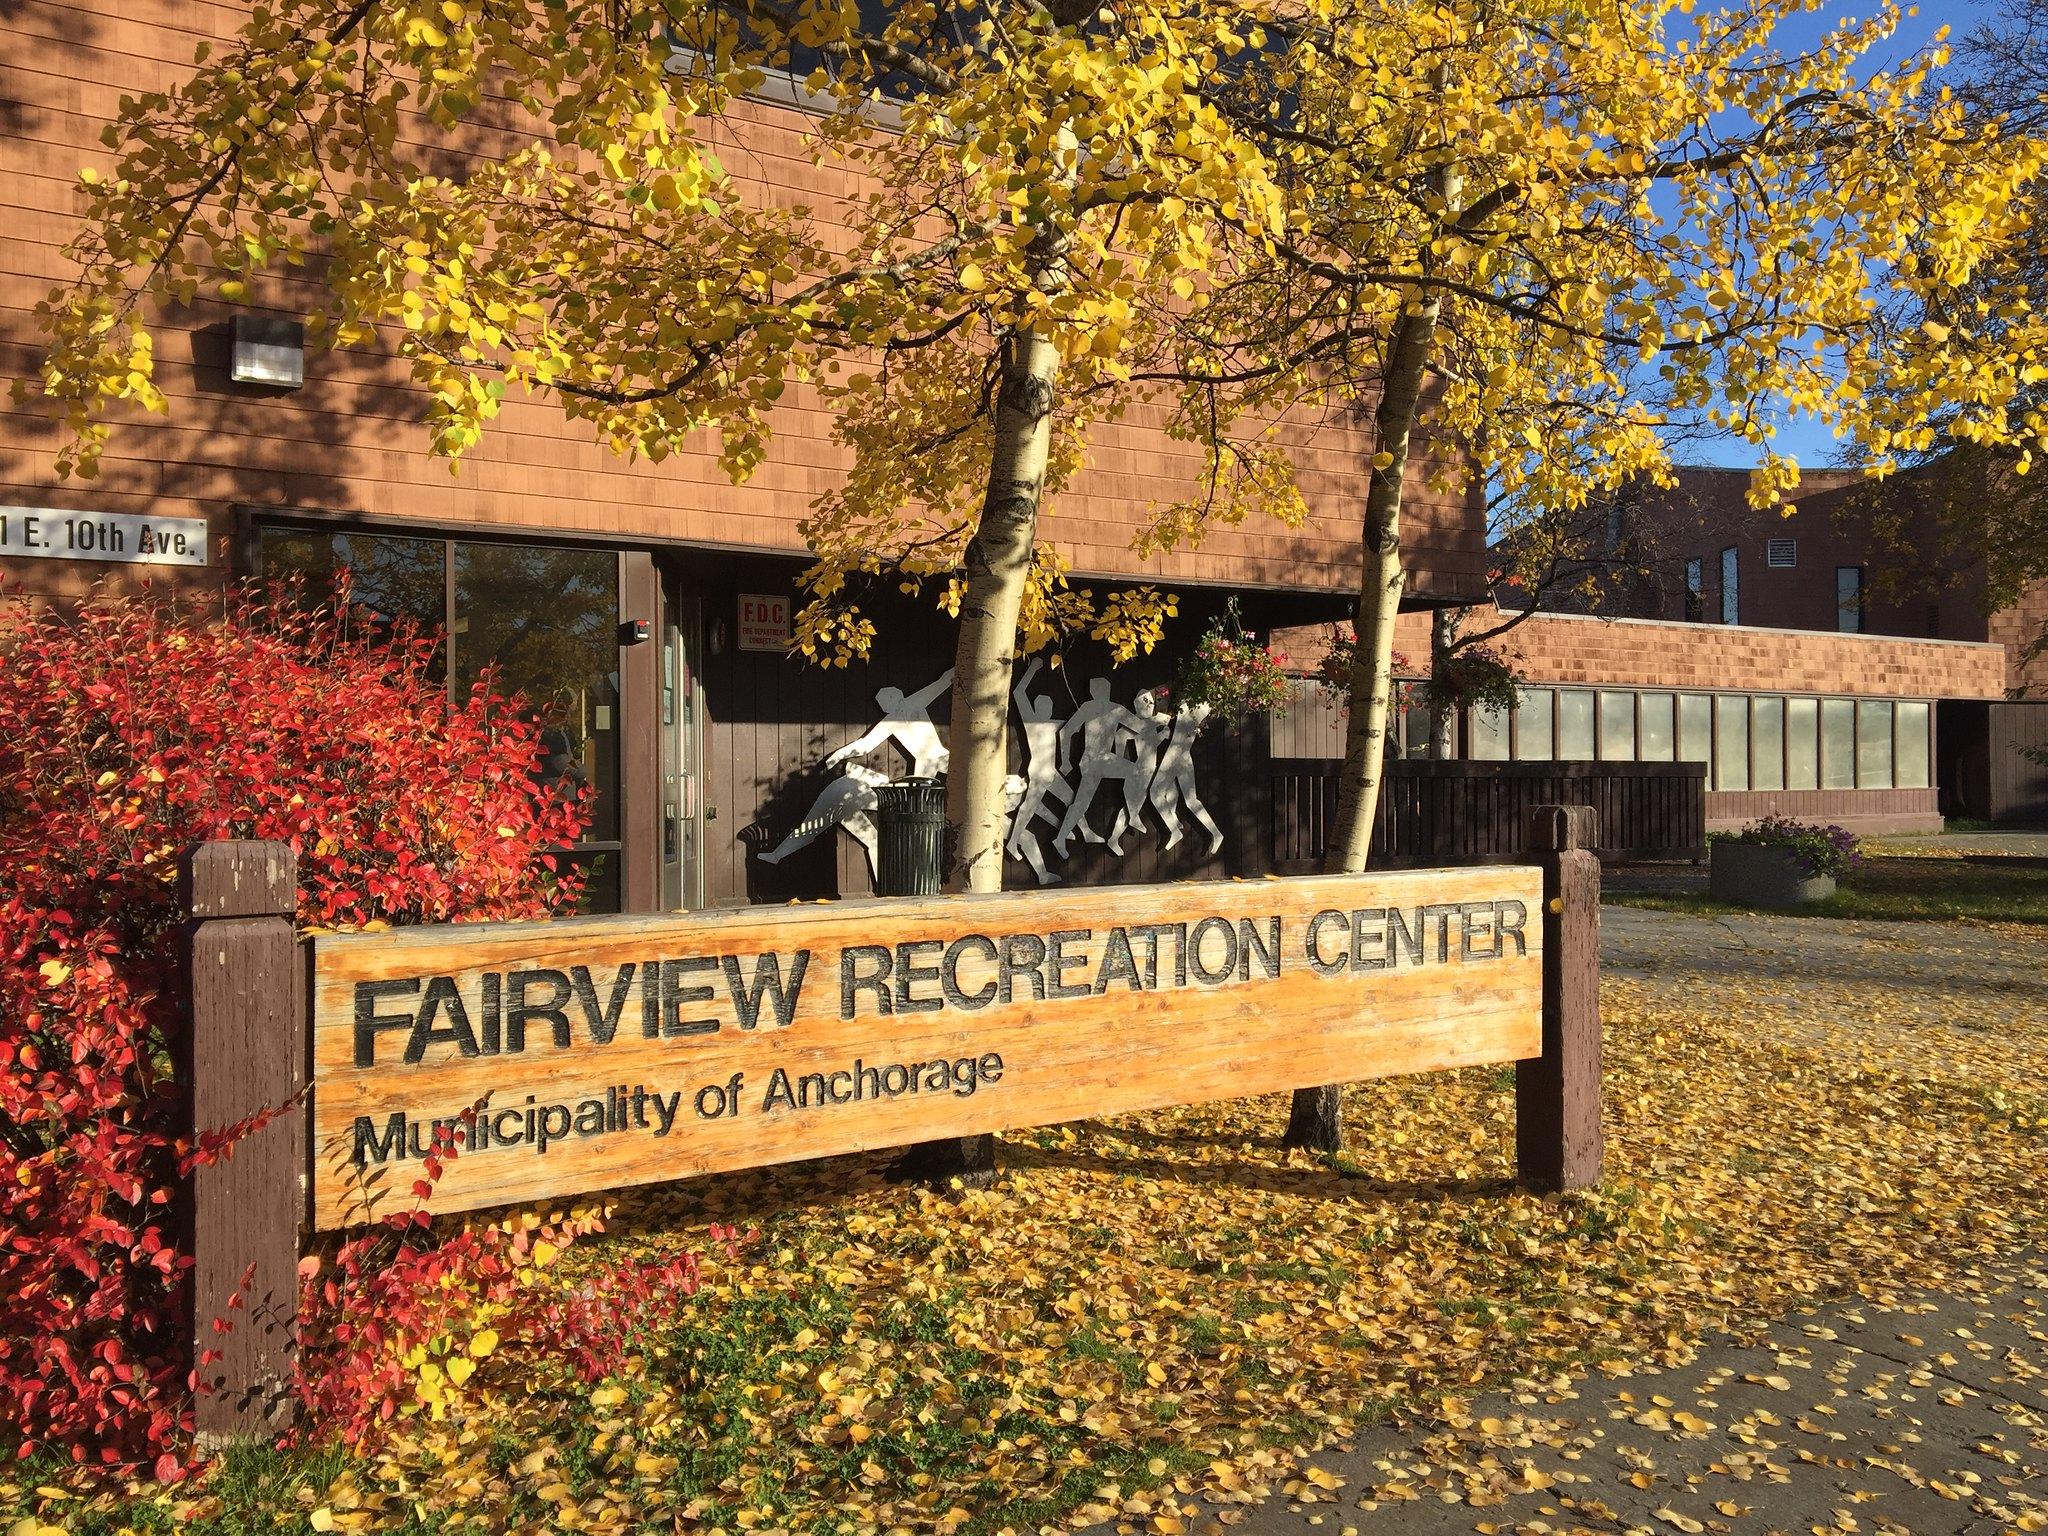 Fairview Rec Center